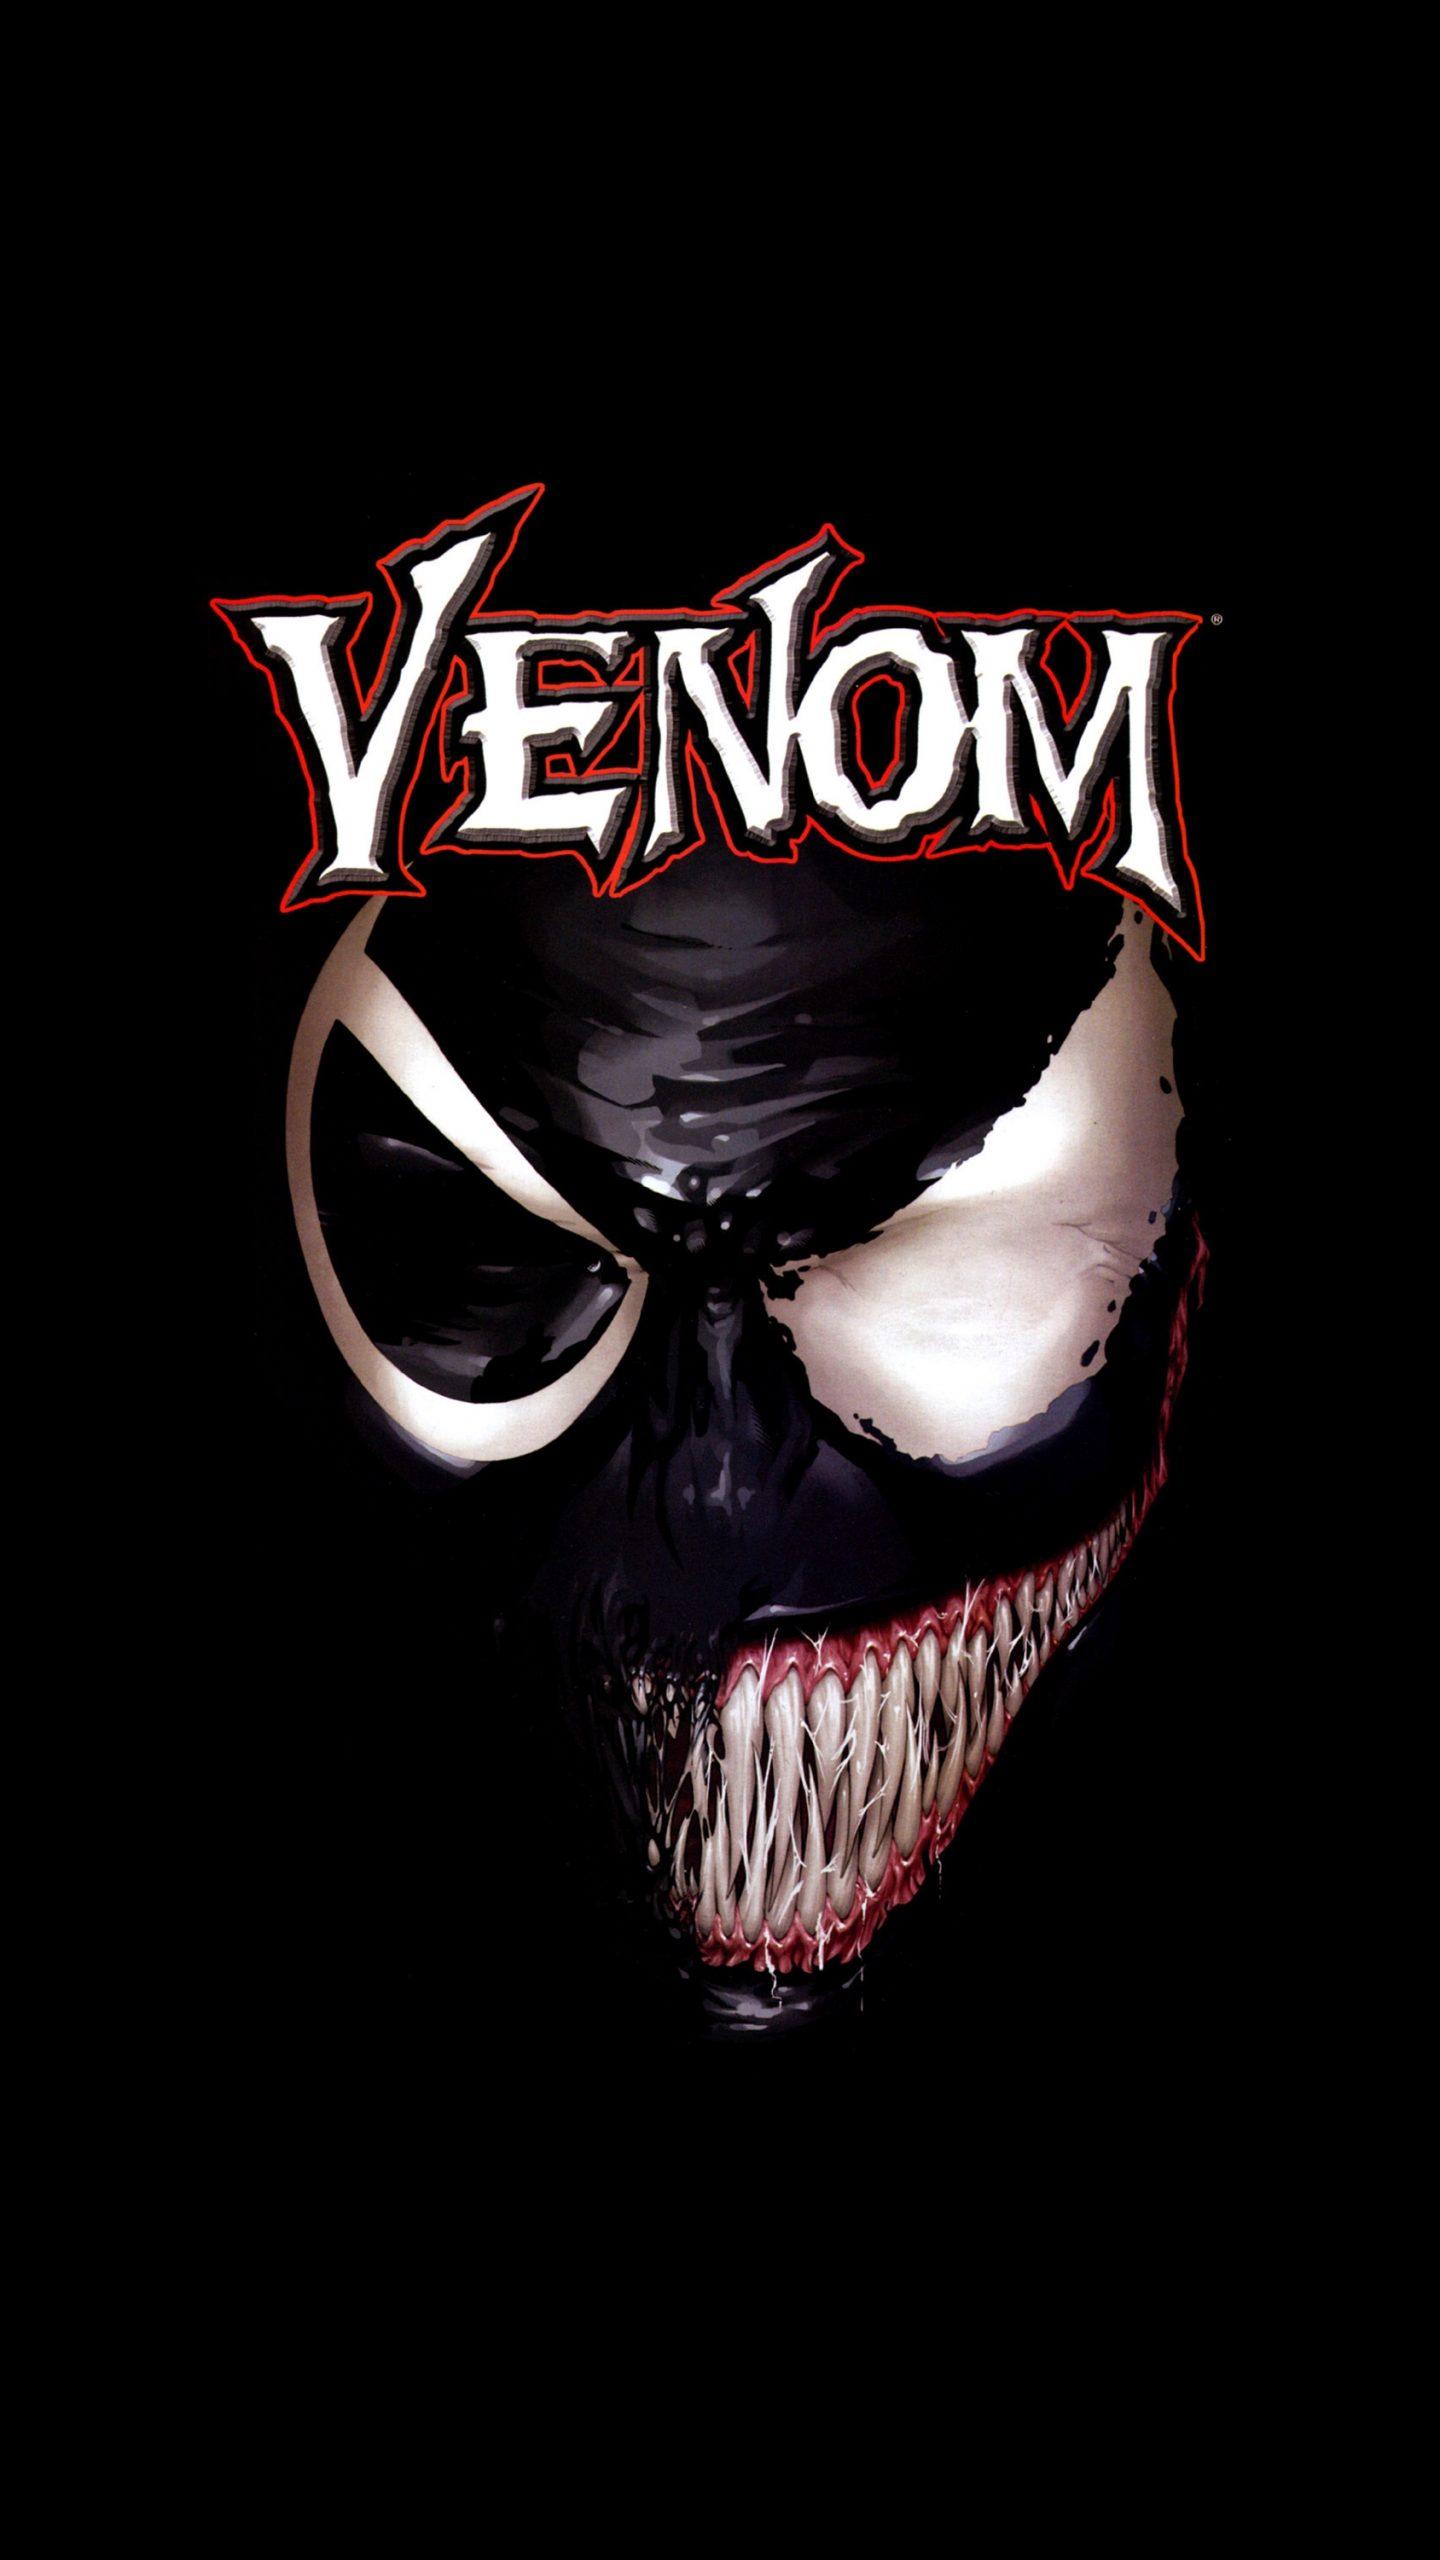 Venom Movie Black Poster 4k Wallpaper Best Wallpapers